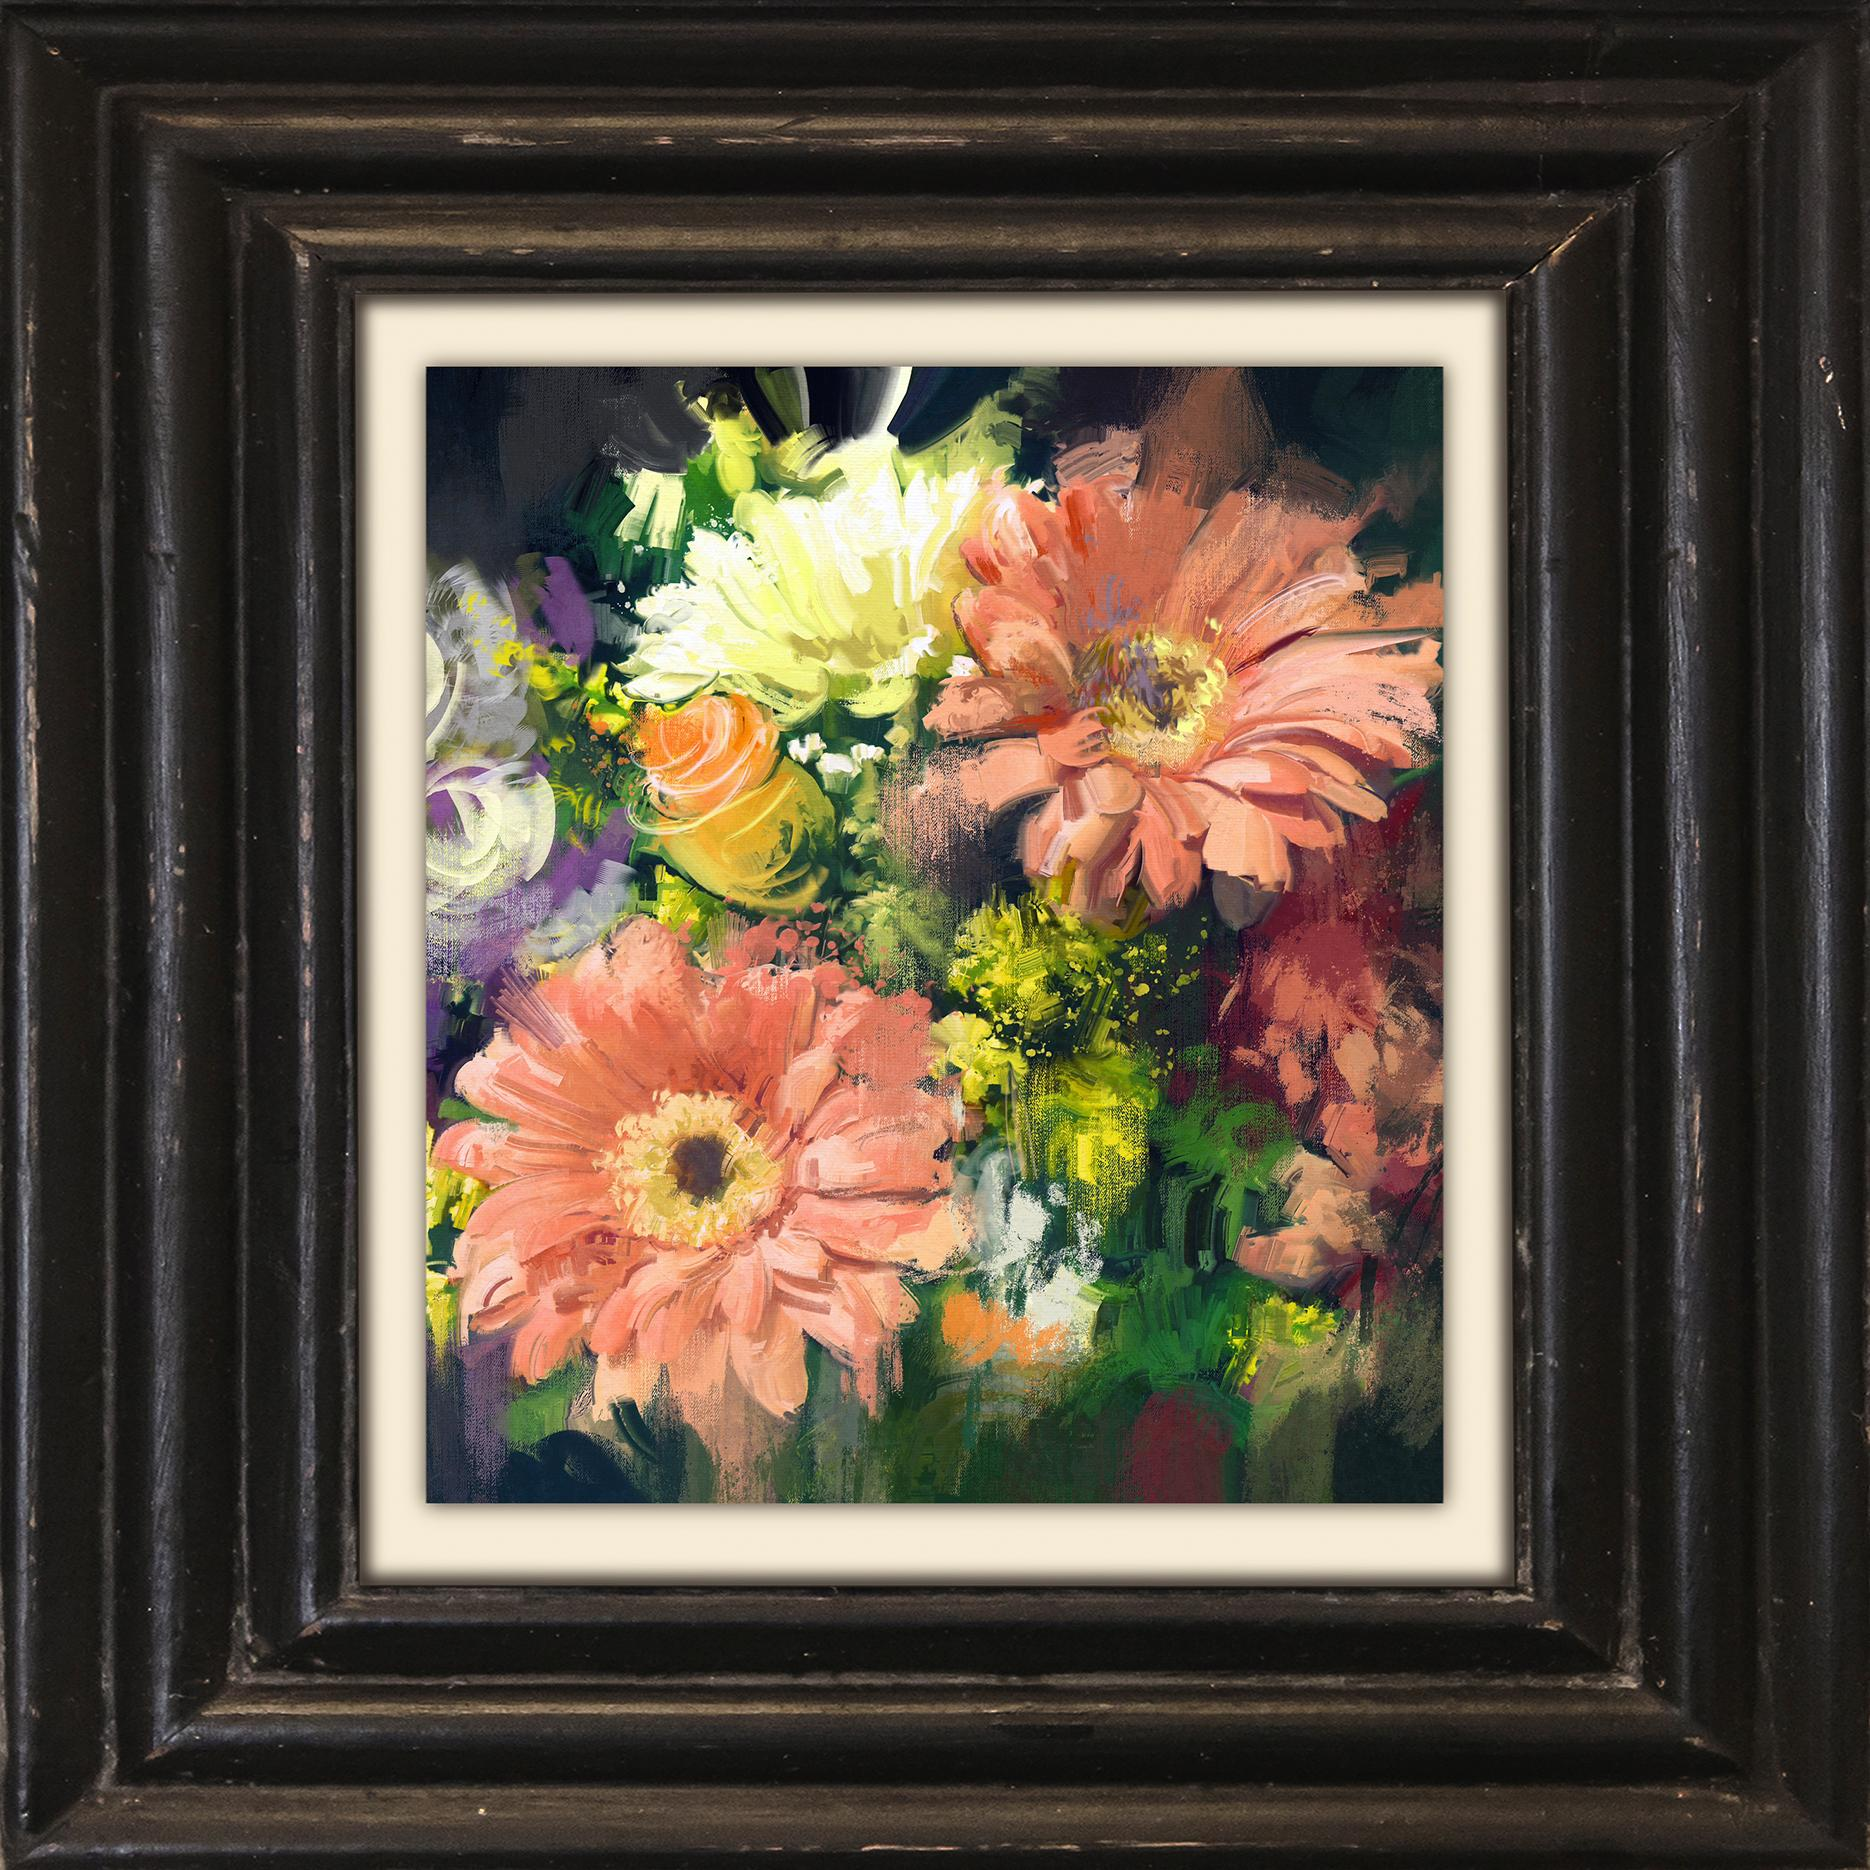 Holzbild »Bouquet«, Blumen